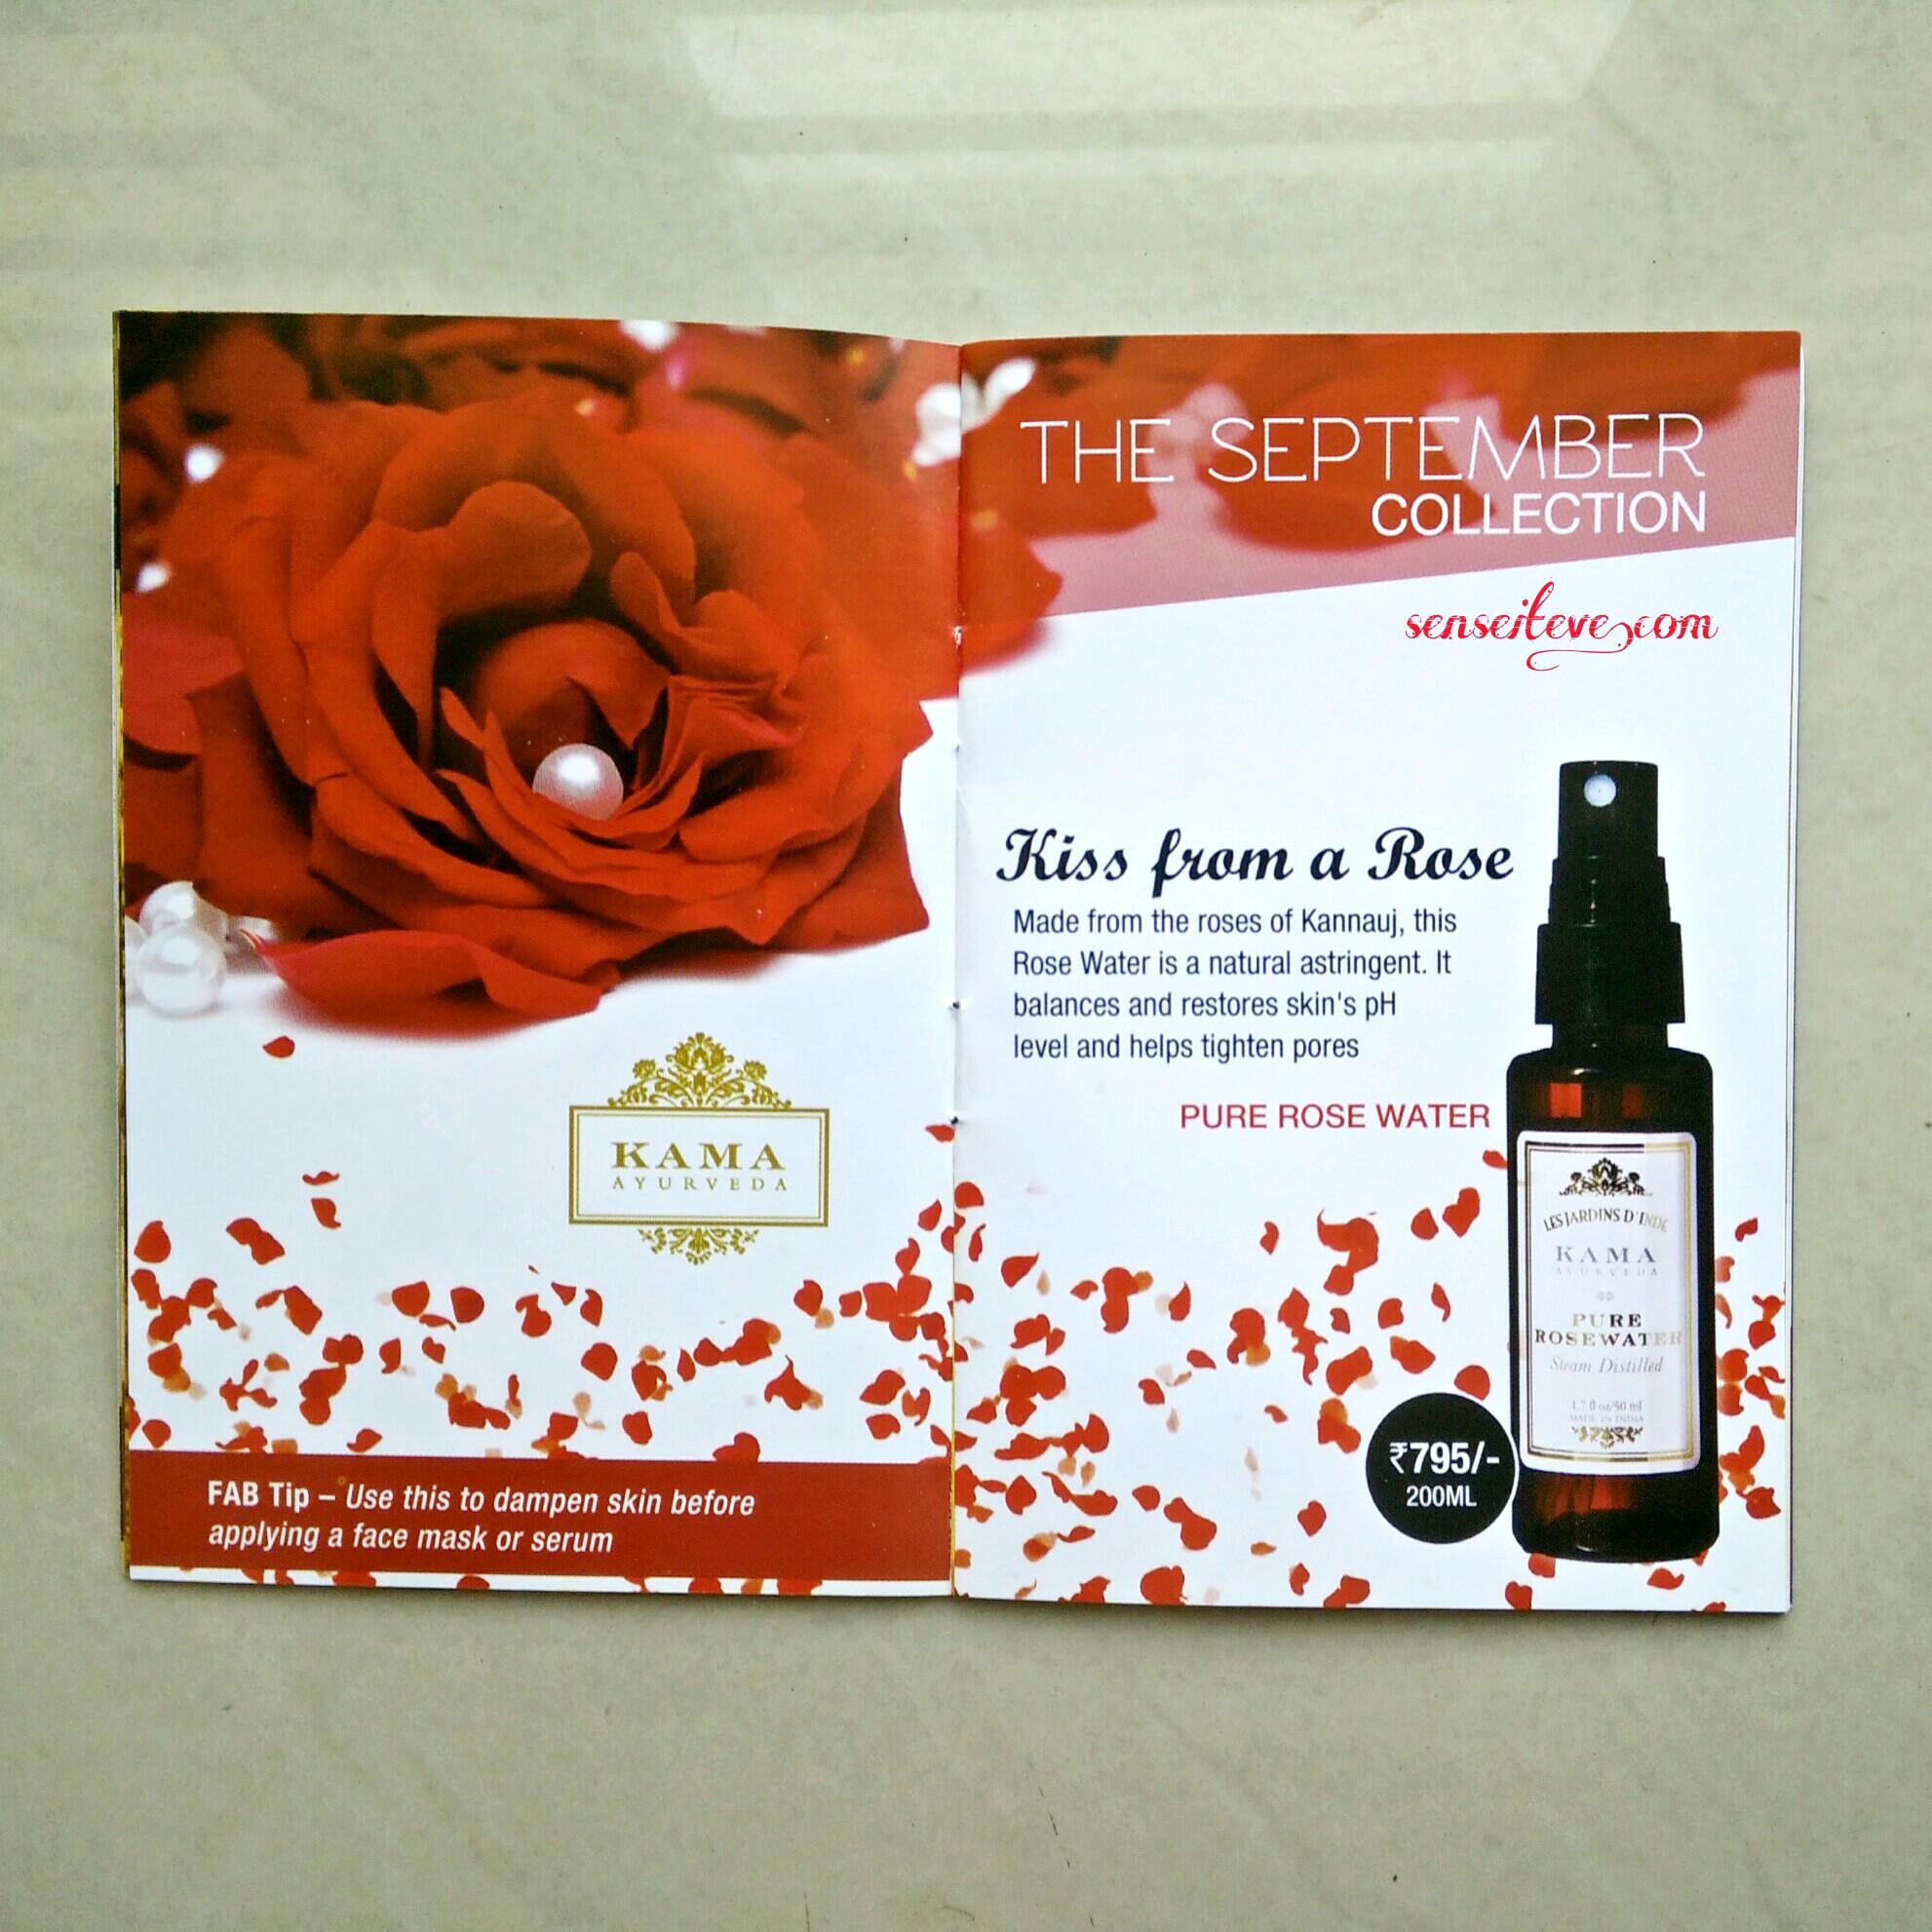 Kama-Ayurveda-Rose-Water-Product-Description